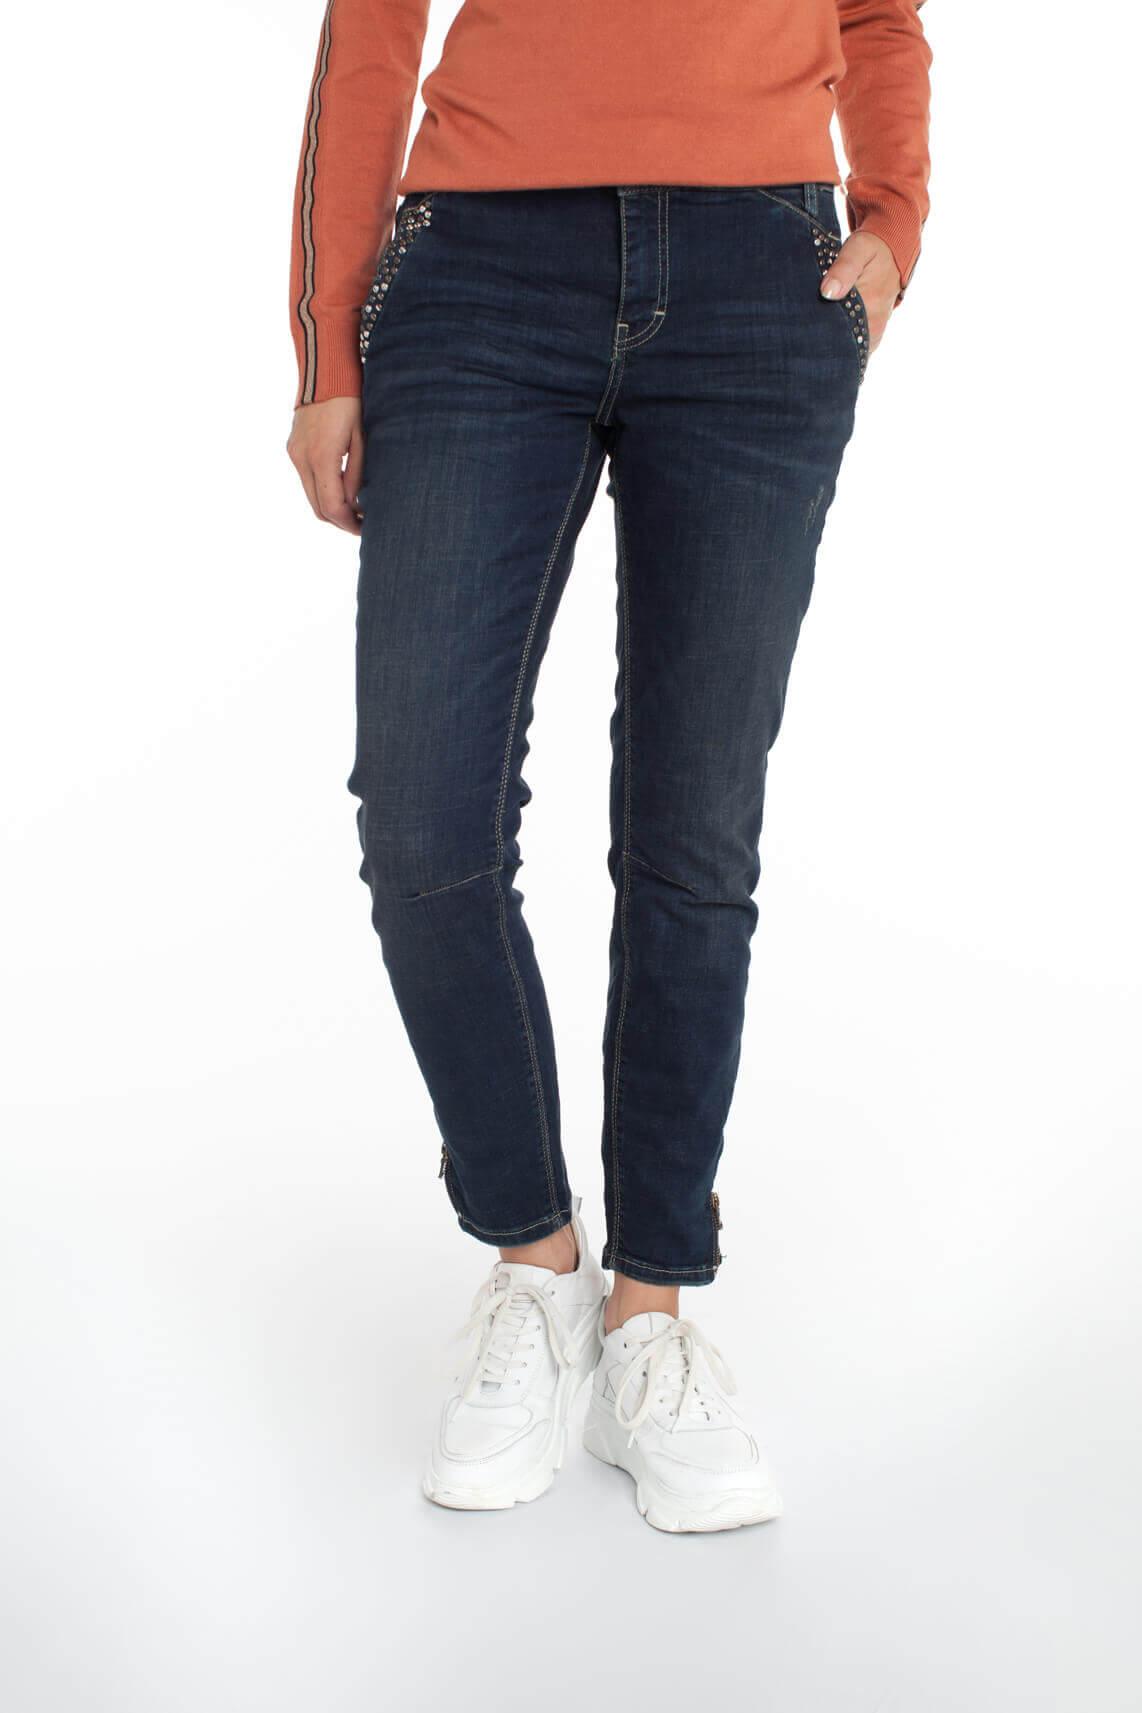 Mos Mosh Dames Trok jeans met studs Blauw